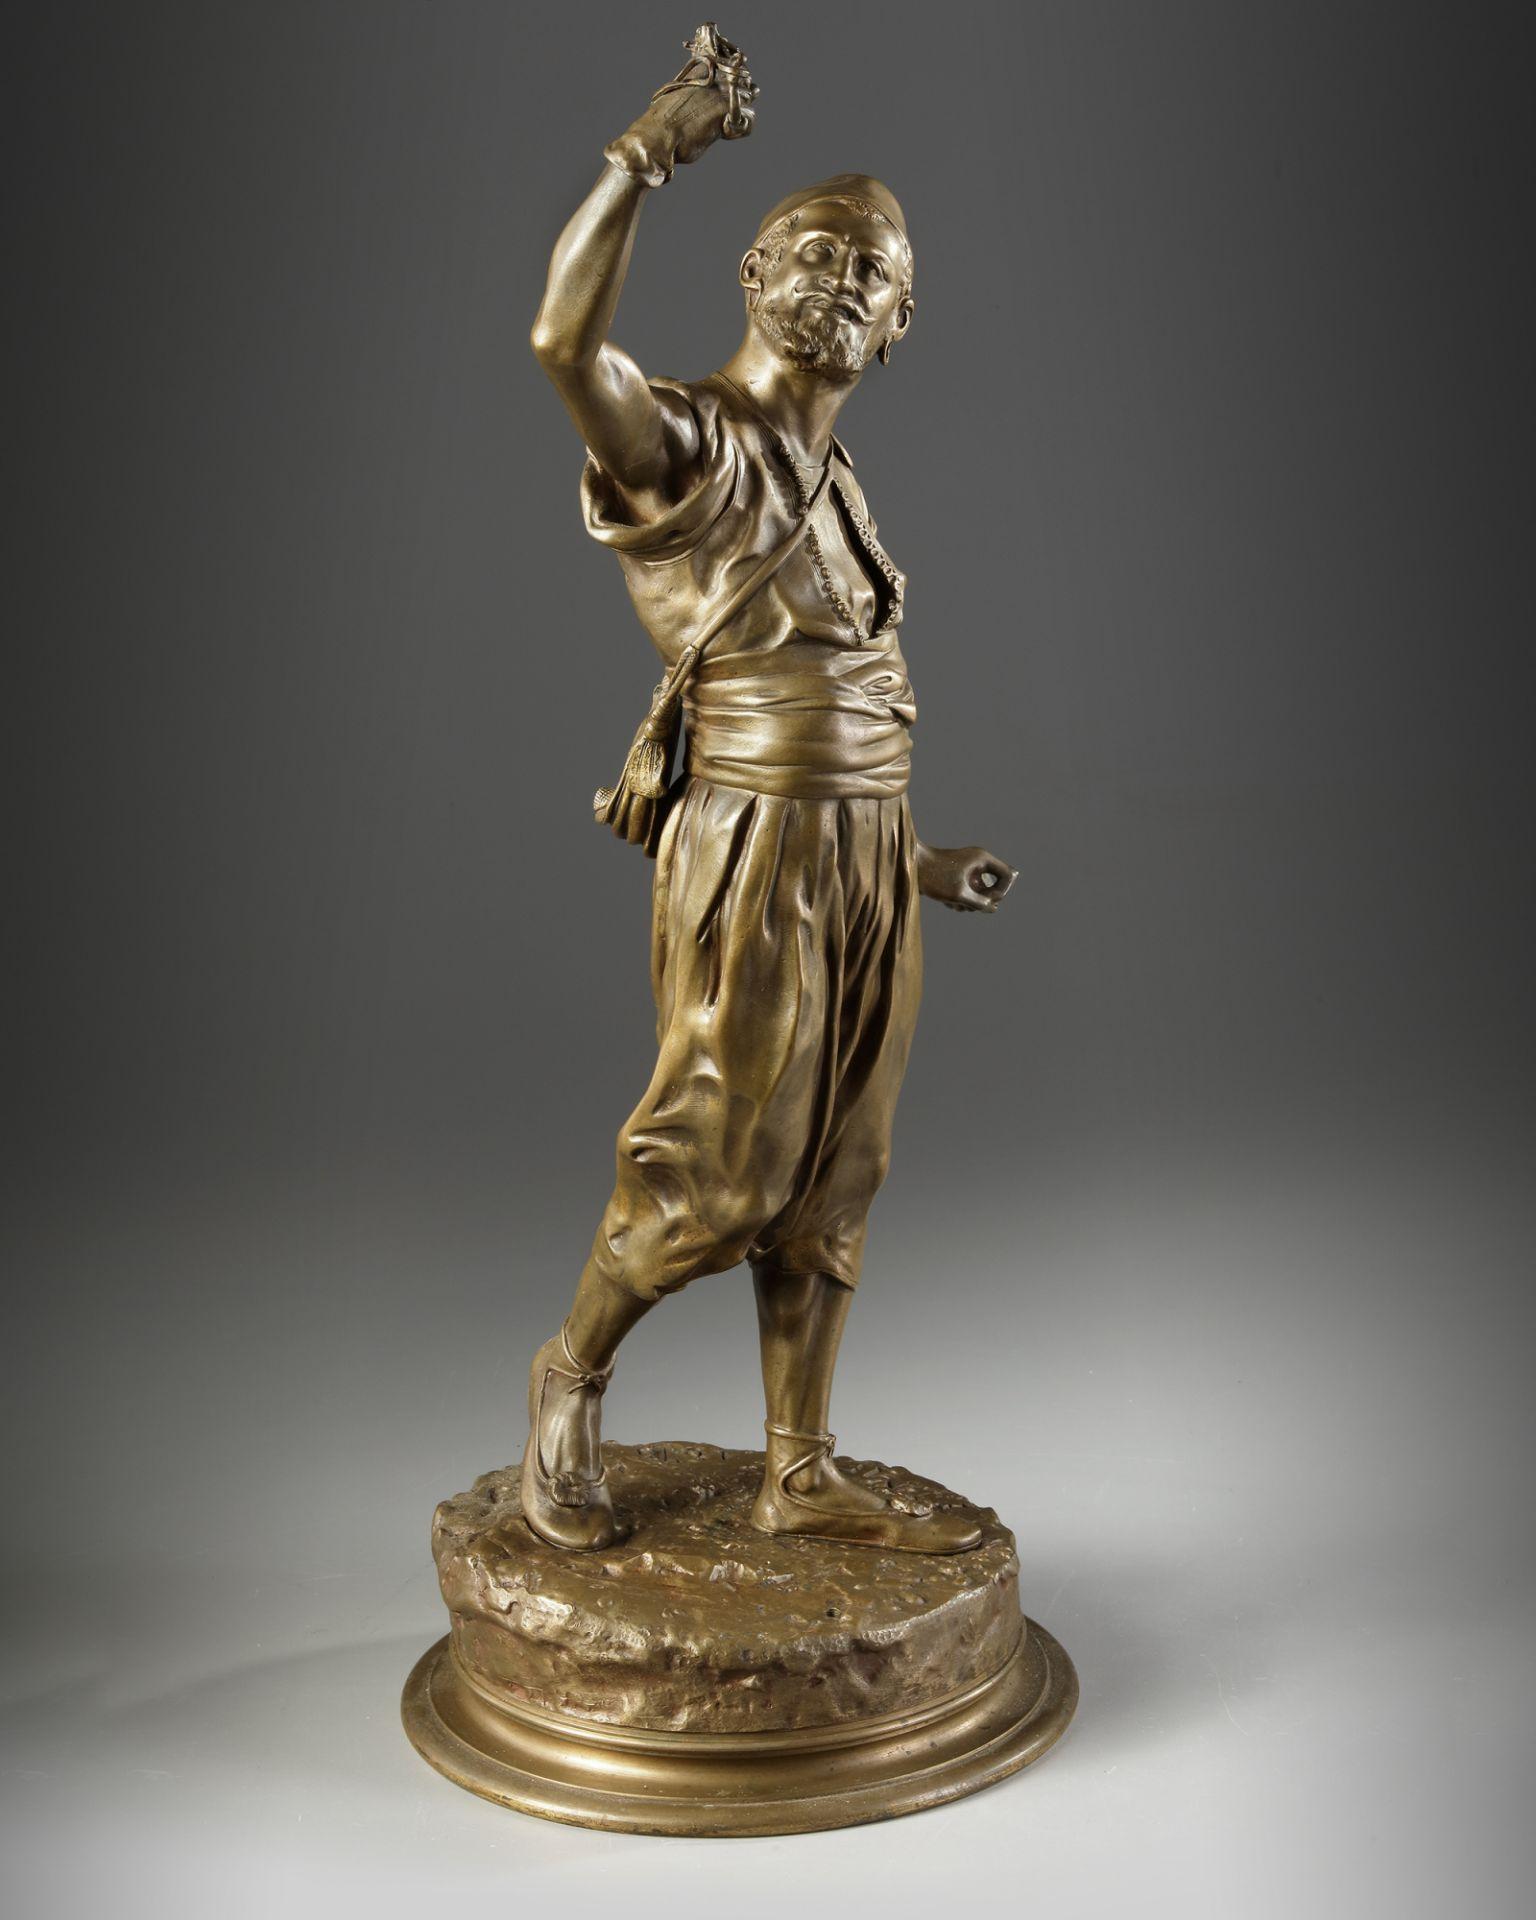 A BRONZE FIGURE, JULES MÈNE, 19TH CENTURY - Image 3 of 4